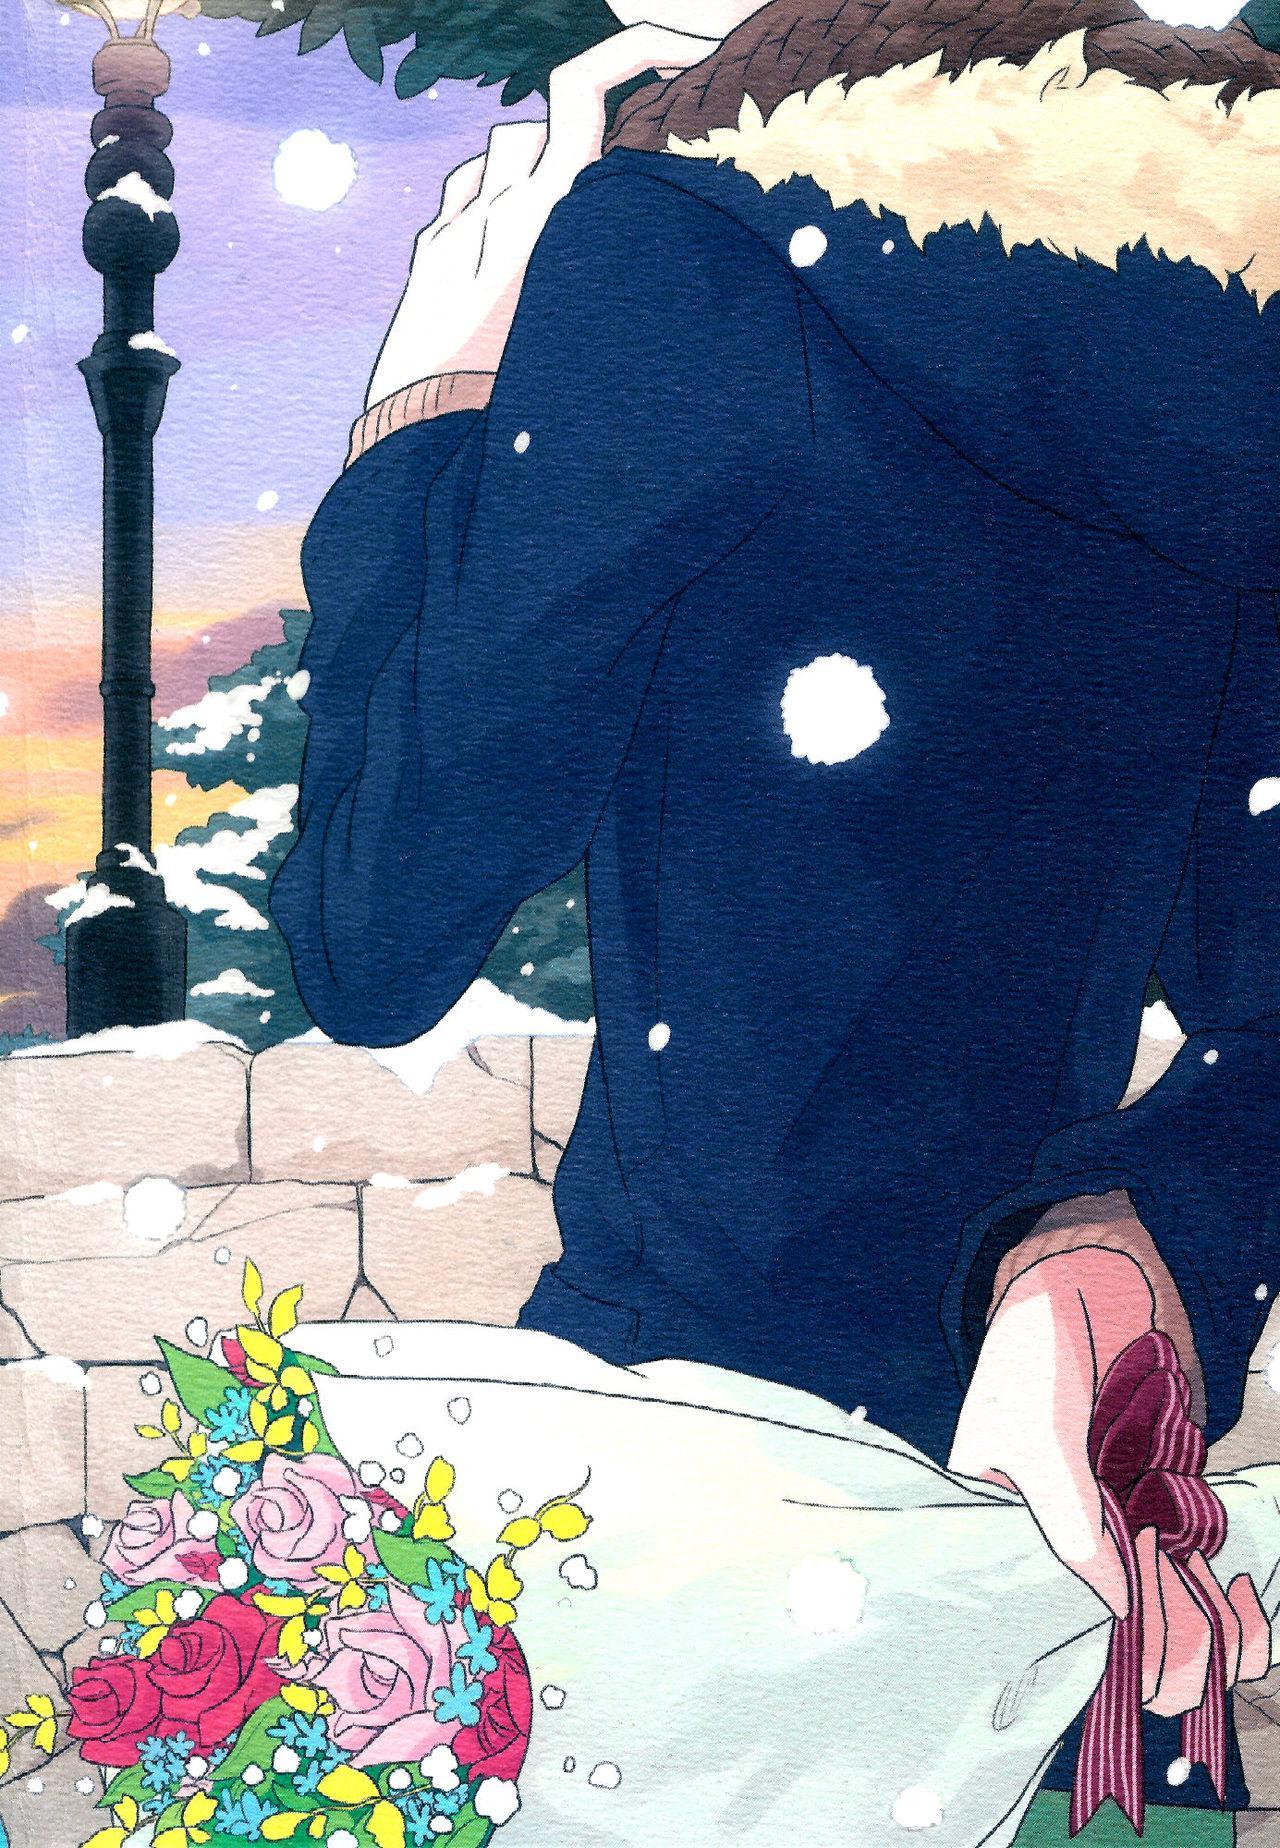 (Bokura no Love Live! 10) [Labo (Various)] Maki-chan Aisare aiueo!   Maki-chan Loved Alphabetically! (Love Live!) [English] {/u/ scanlations} [Incomplete] 1